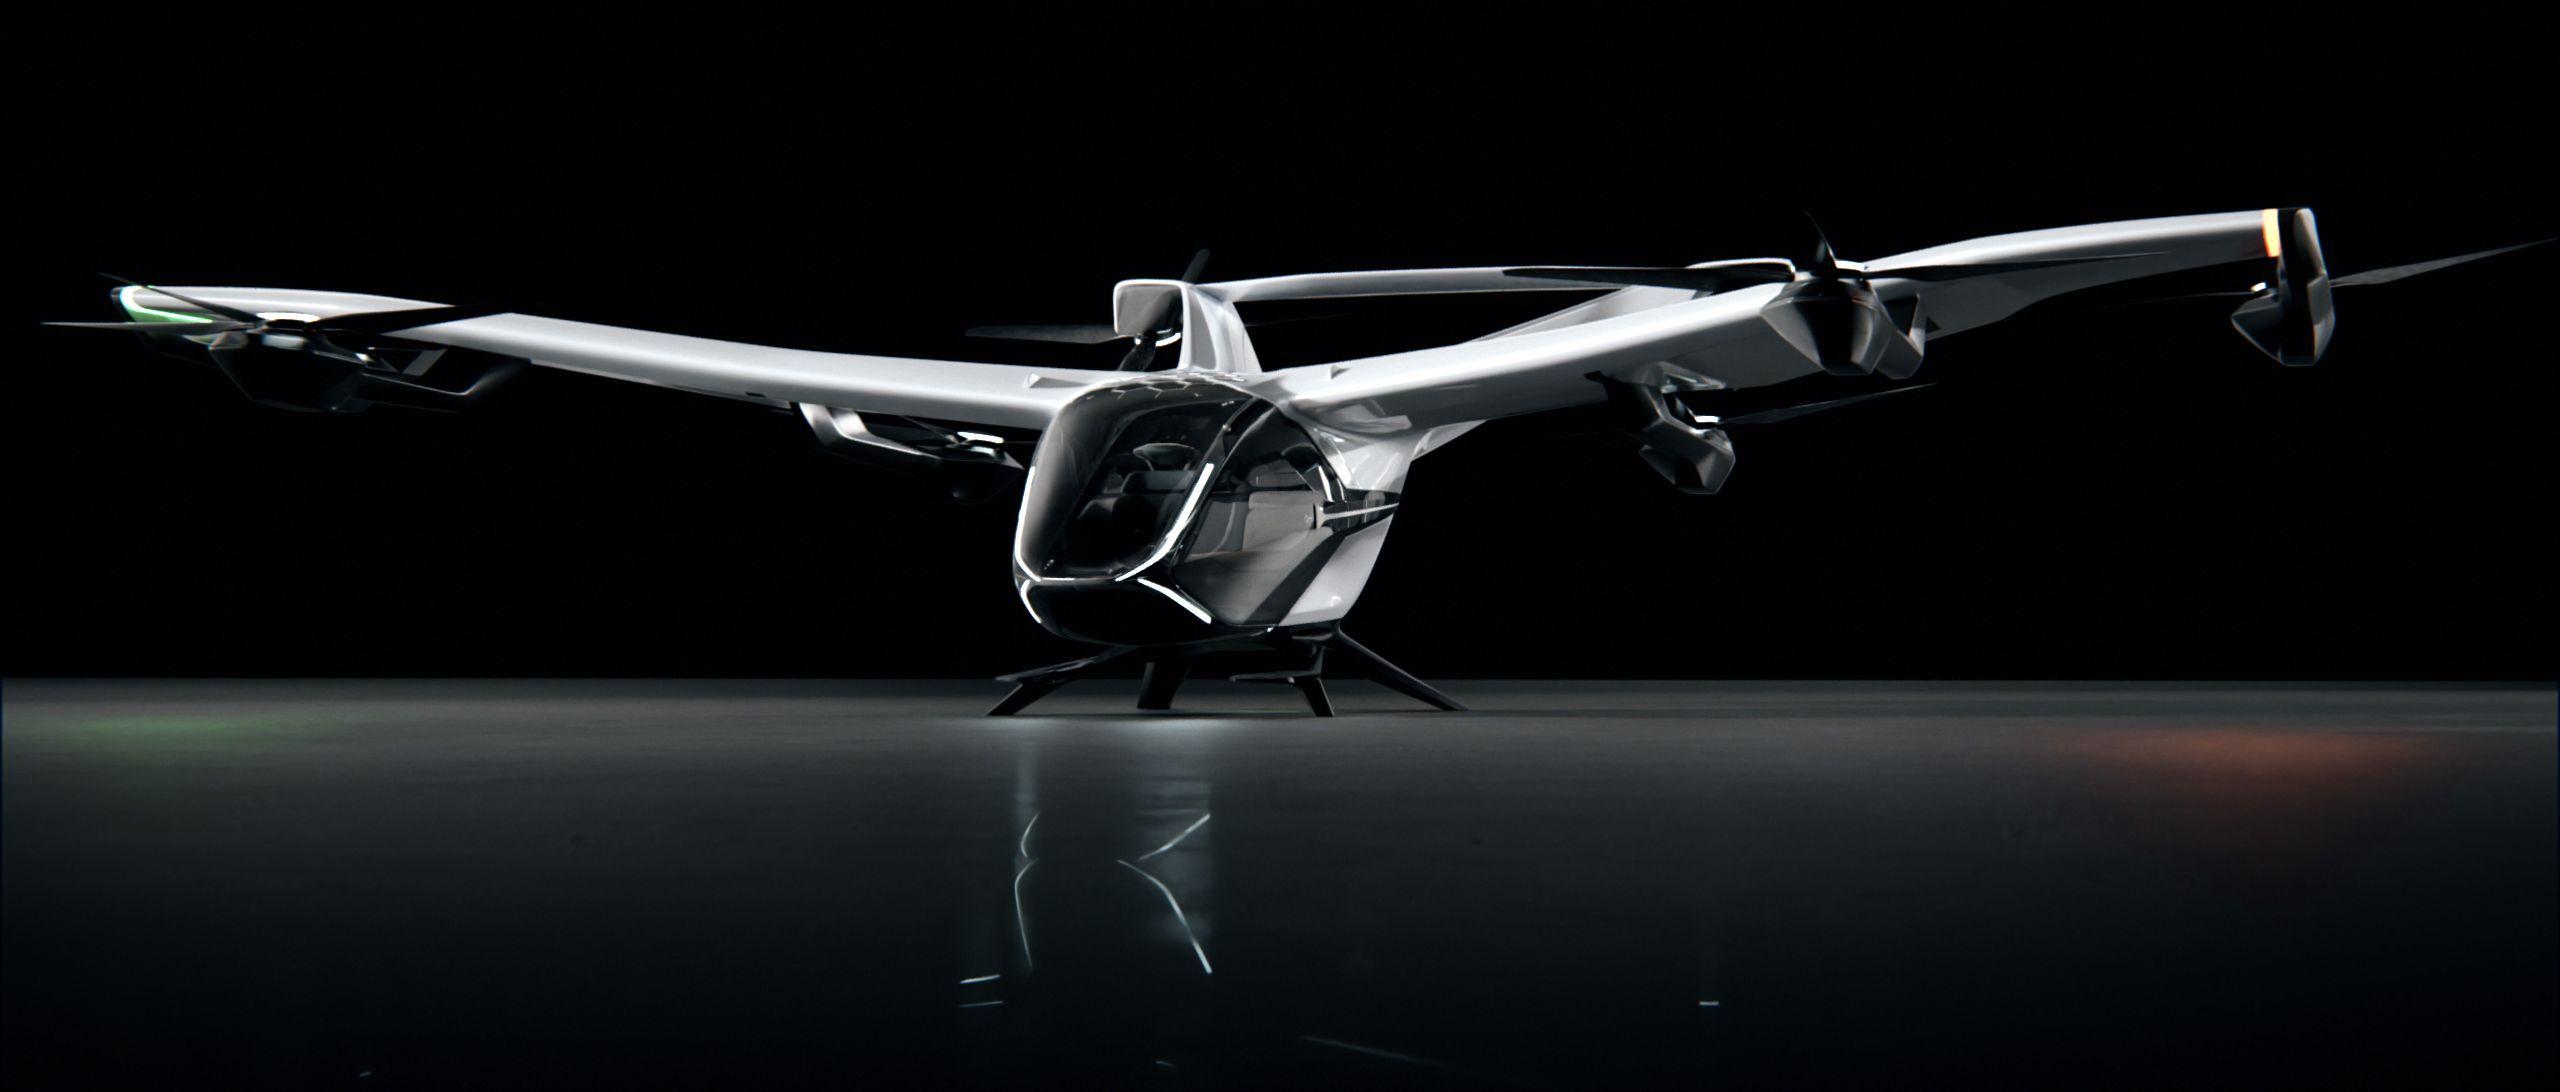 Airbus' new cityAirbus Nextgen eVTOL aircraft